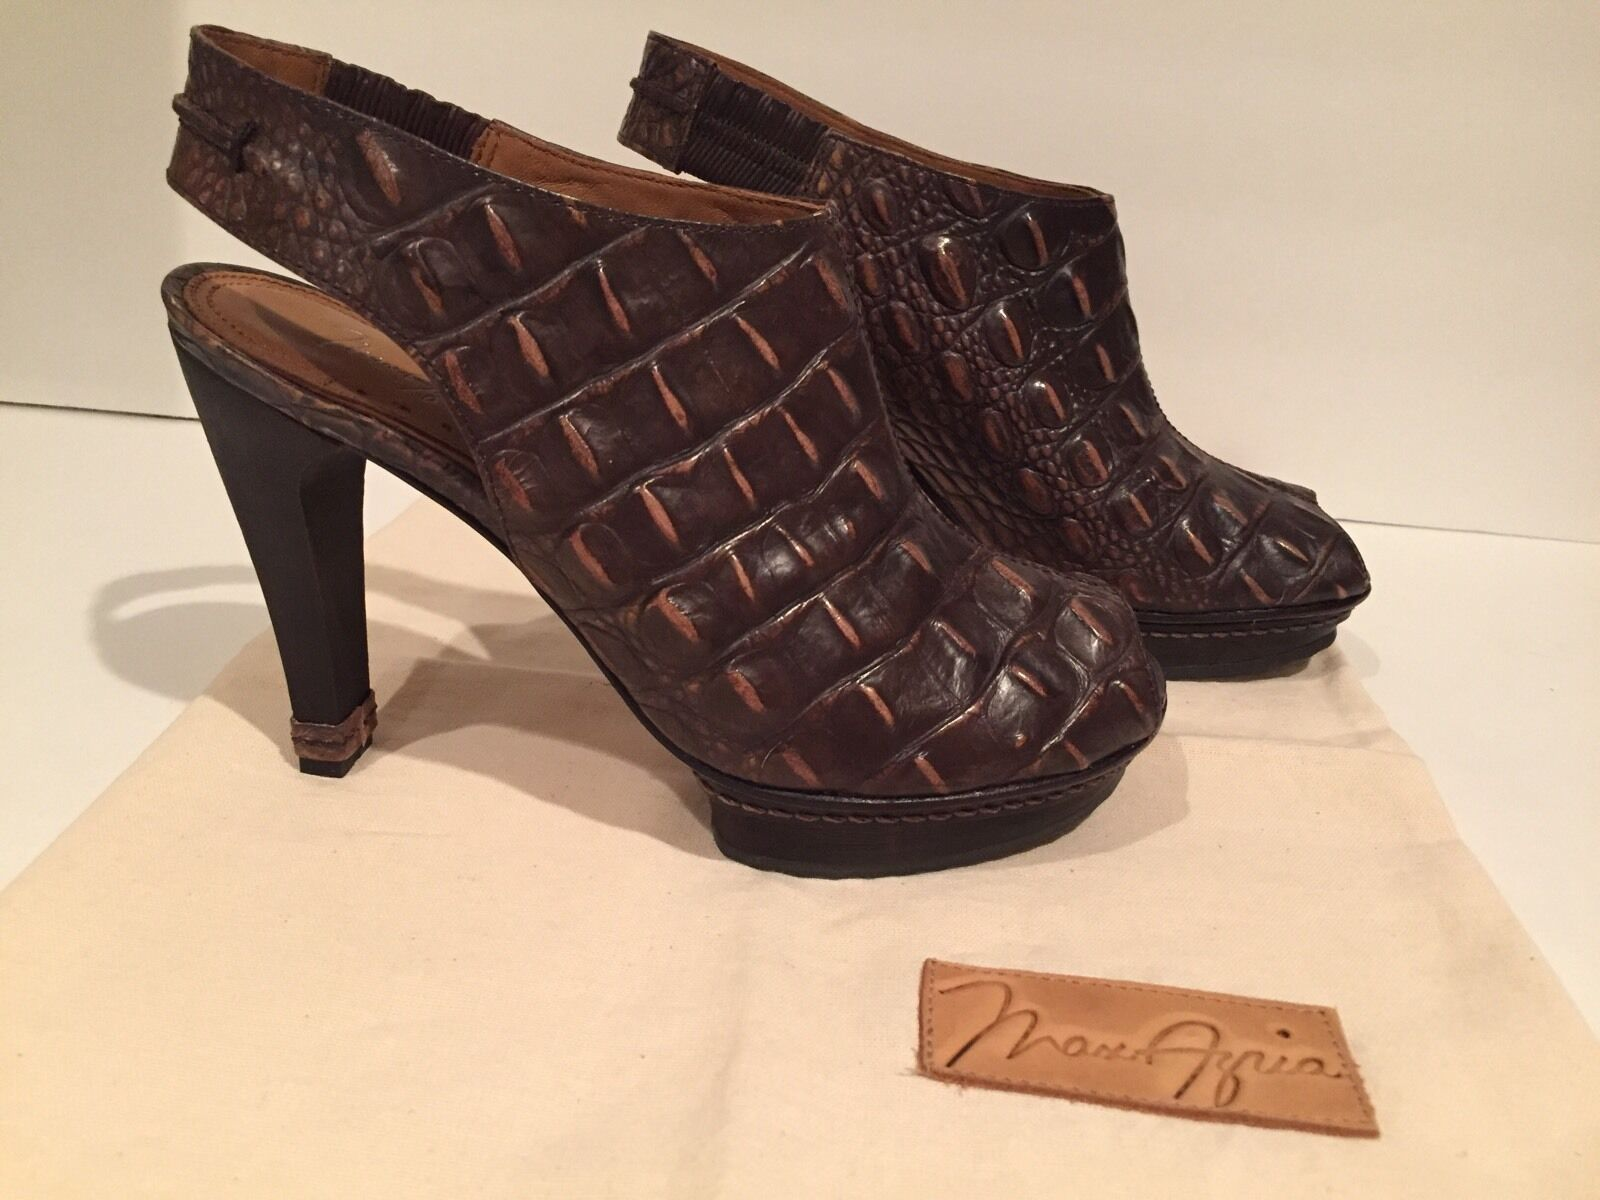 Max Azria Slingbacks Sandales Open Toe Croc Leder Slingbacks Azria Distressed Braun 37.5/7-7.5 6c6a95